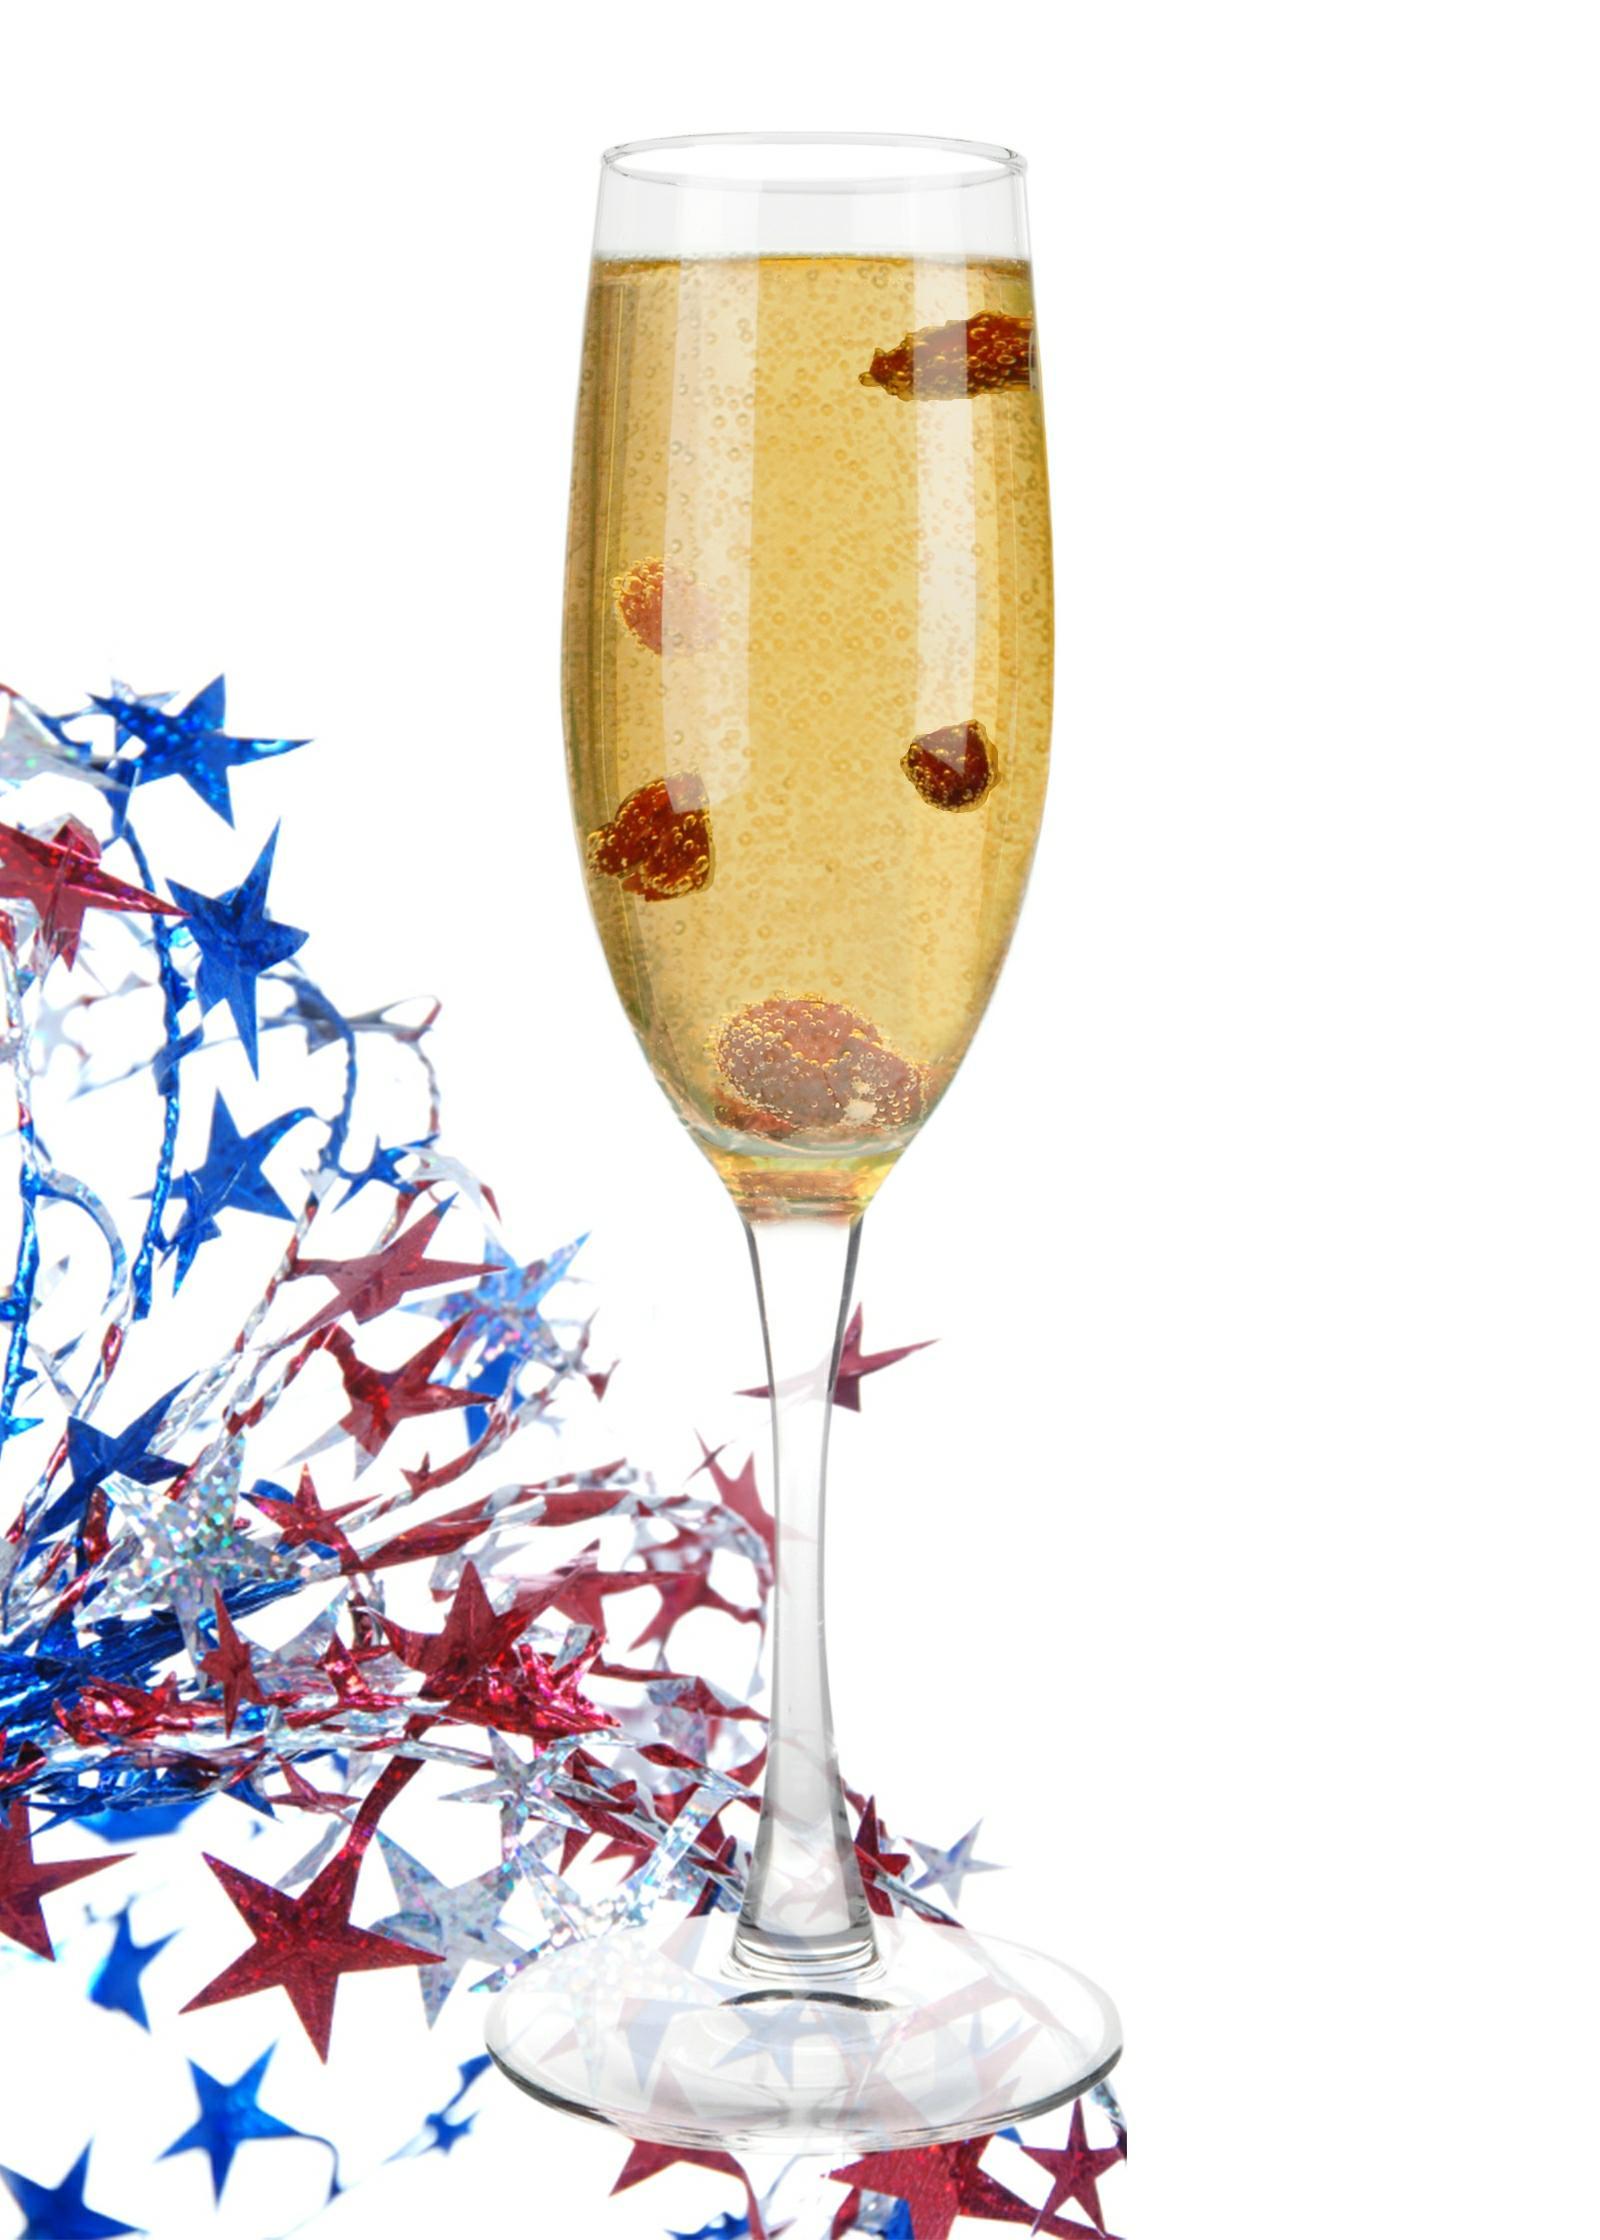 Tuaca champagne cocktail dress